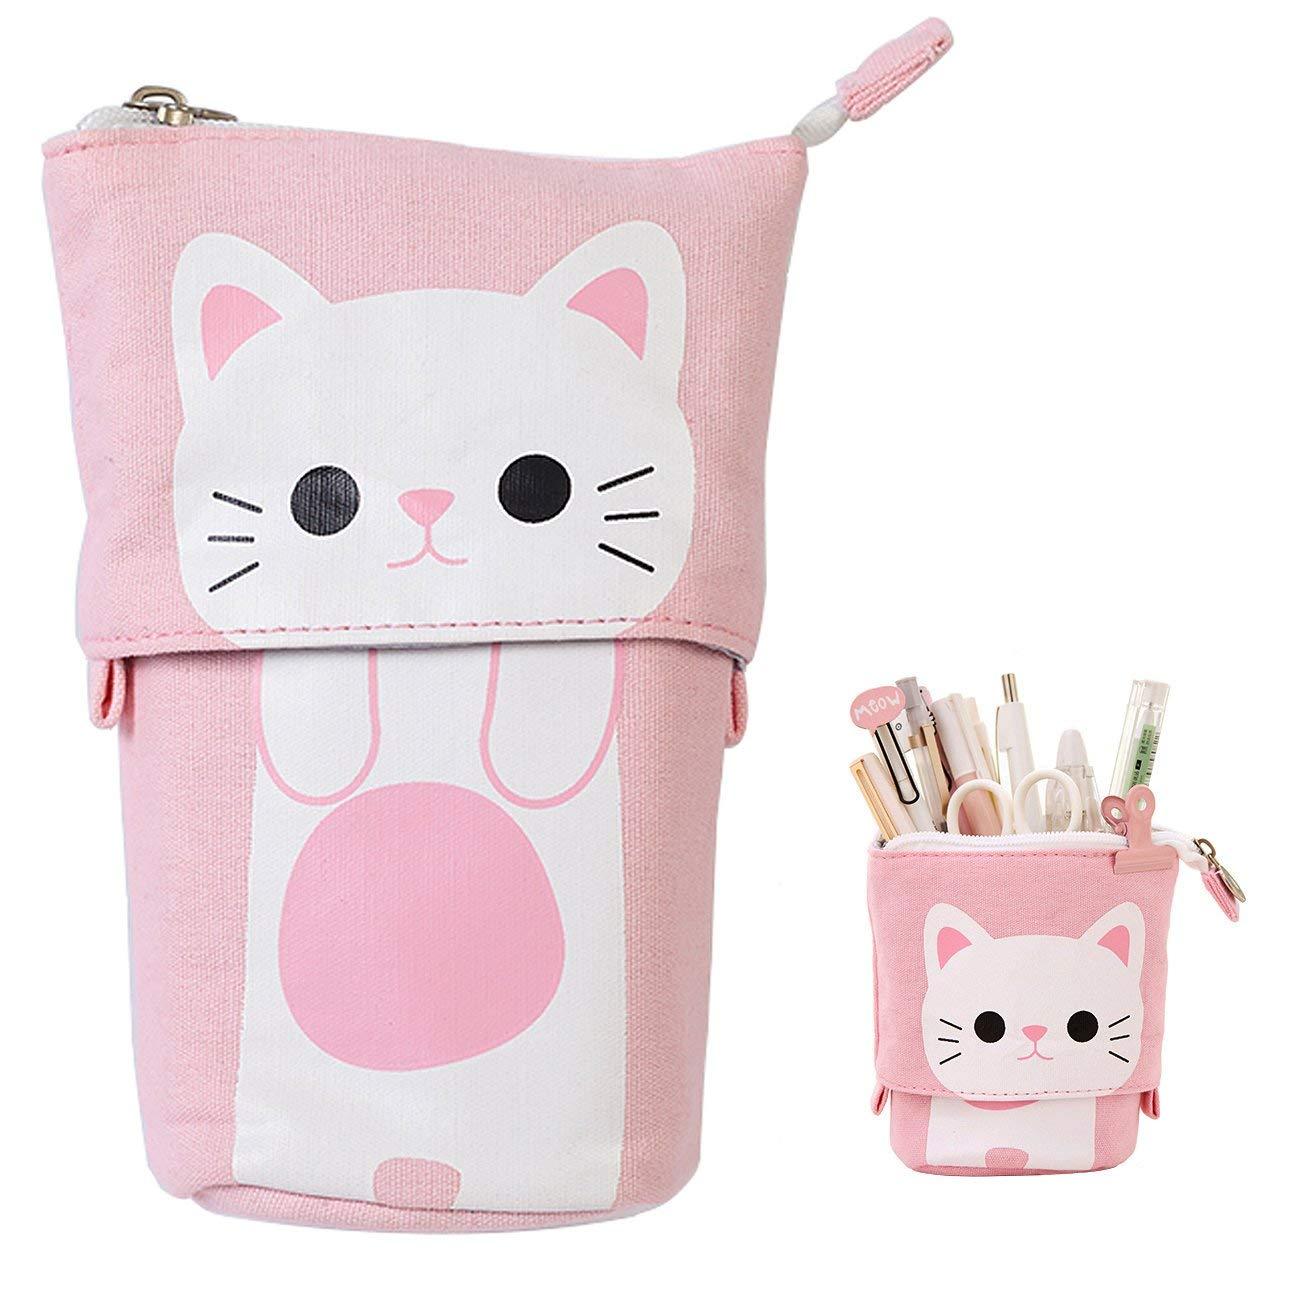 Kawaii Pencil Case Zipper Cute Cat Pencil Box Standing Stretch Pencilcase School Supplies Student Stationery Trousse Estuches